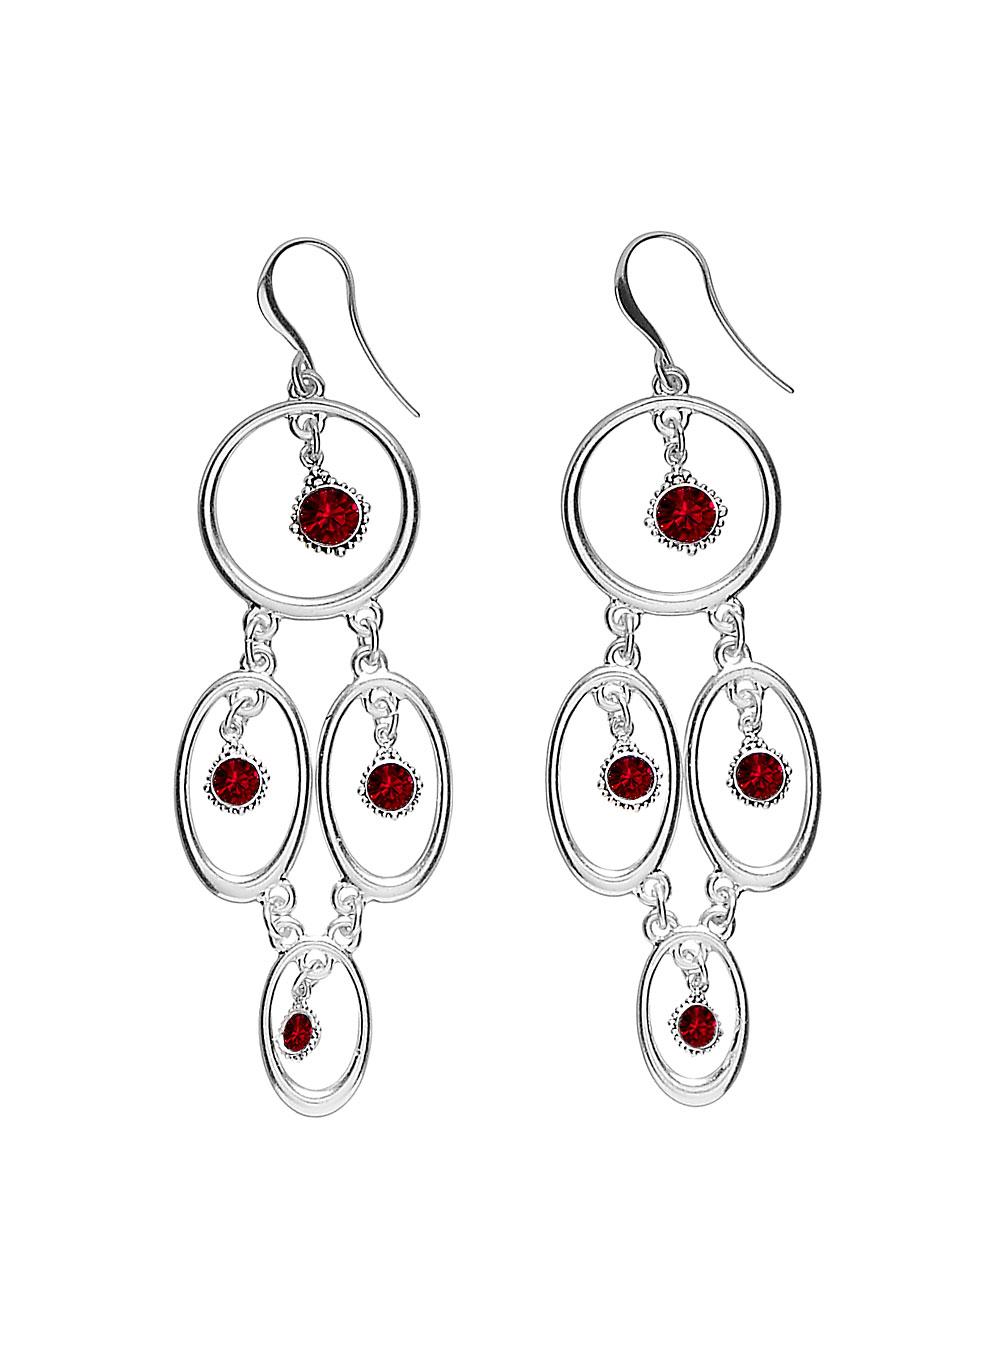 PILGRIM Devotion Chandelier Drop Earrings - Silver Plate Siam Red Swarovski Crystals BNWT